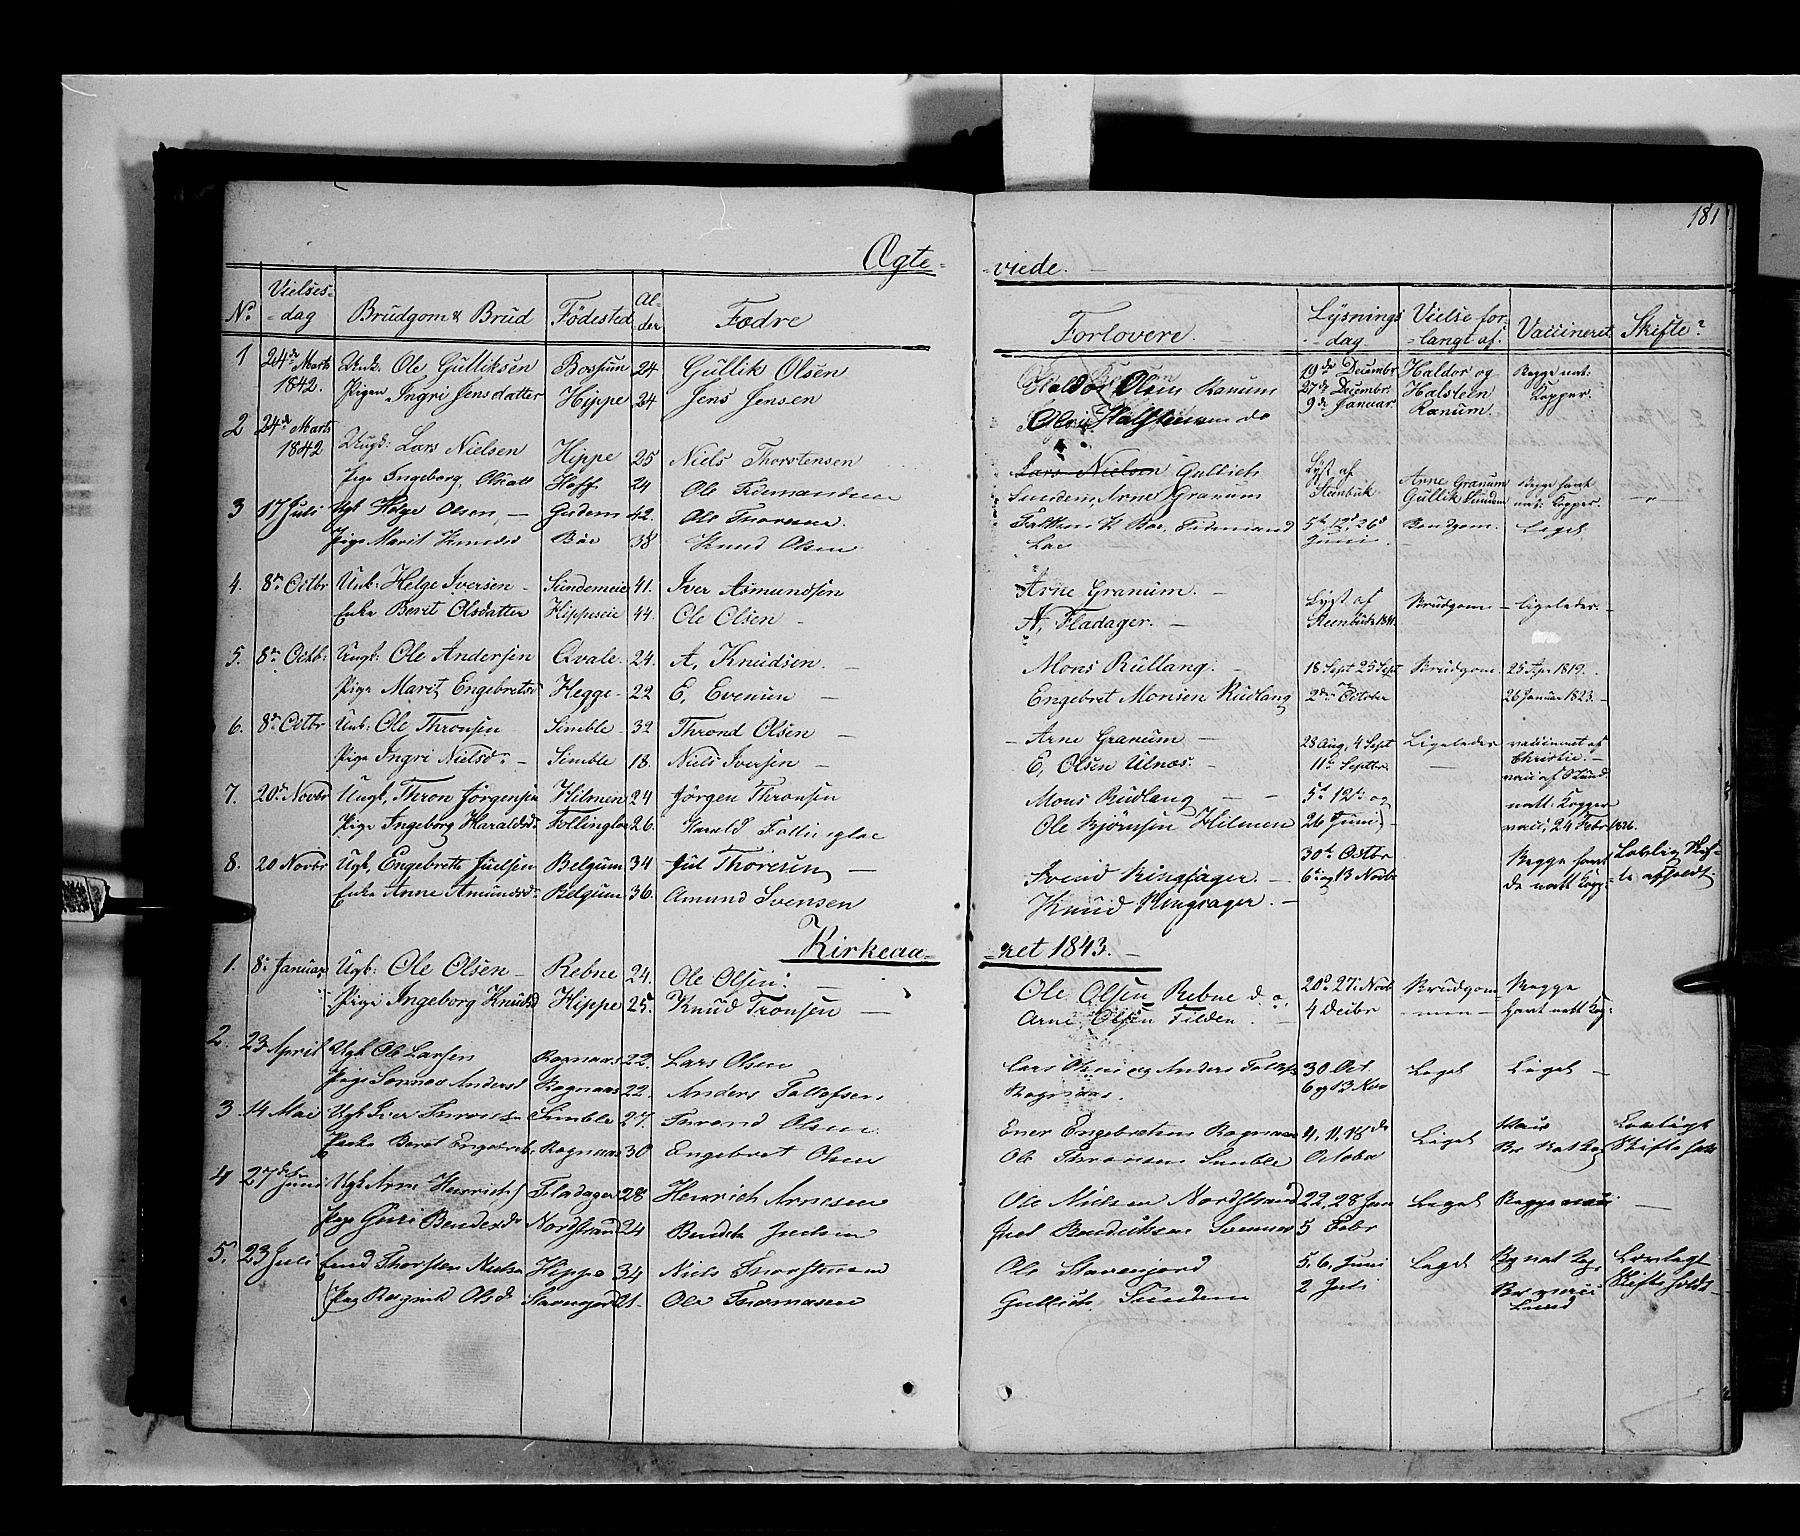 SAH, Nord-Aurdal prestekontor, Ministerialbok nr. 6, 1842-1863, s. 181